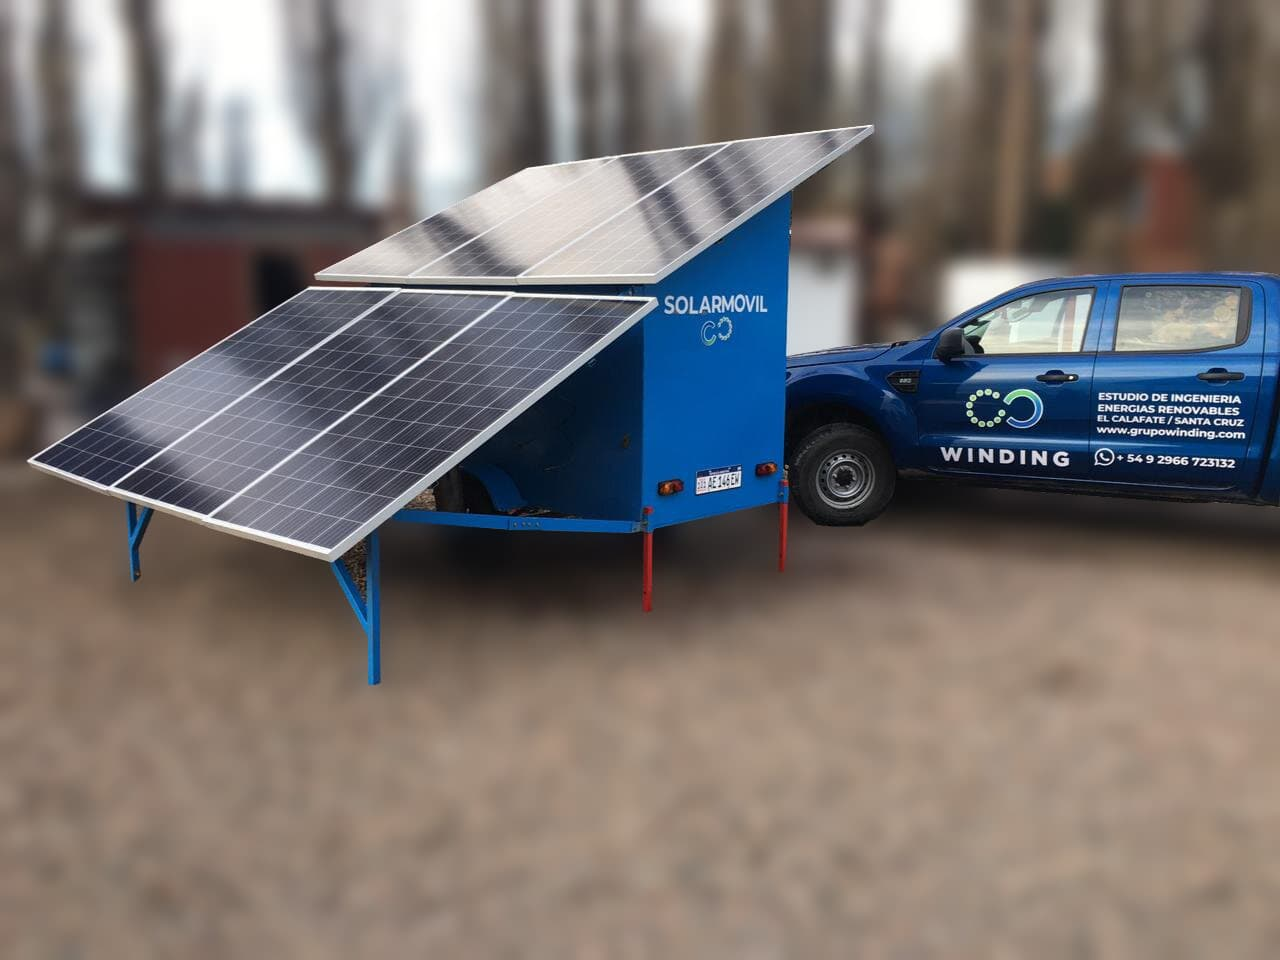 Energía solar movil